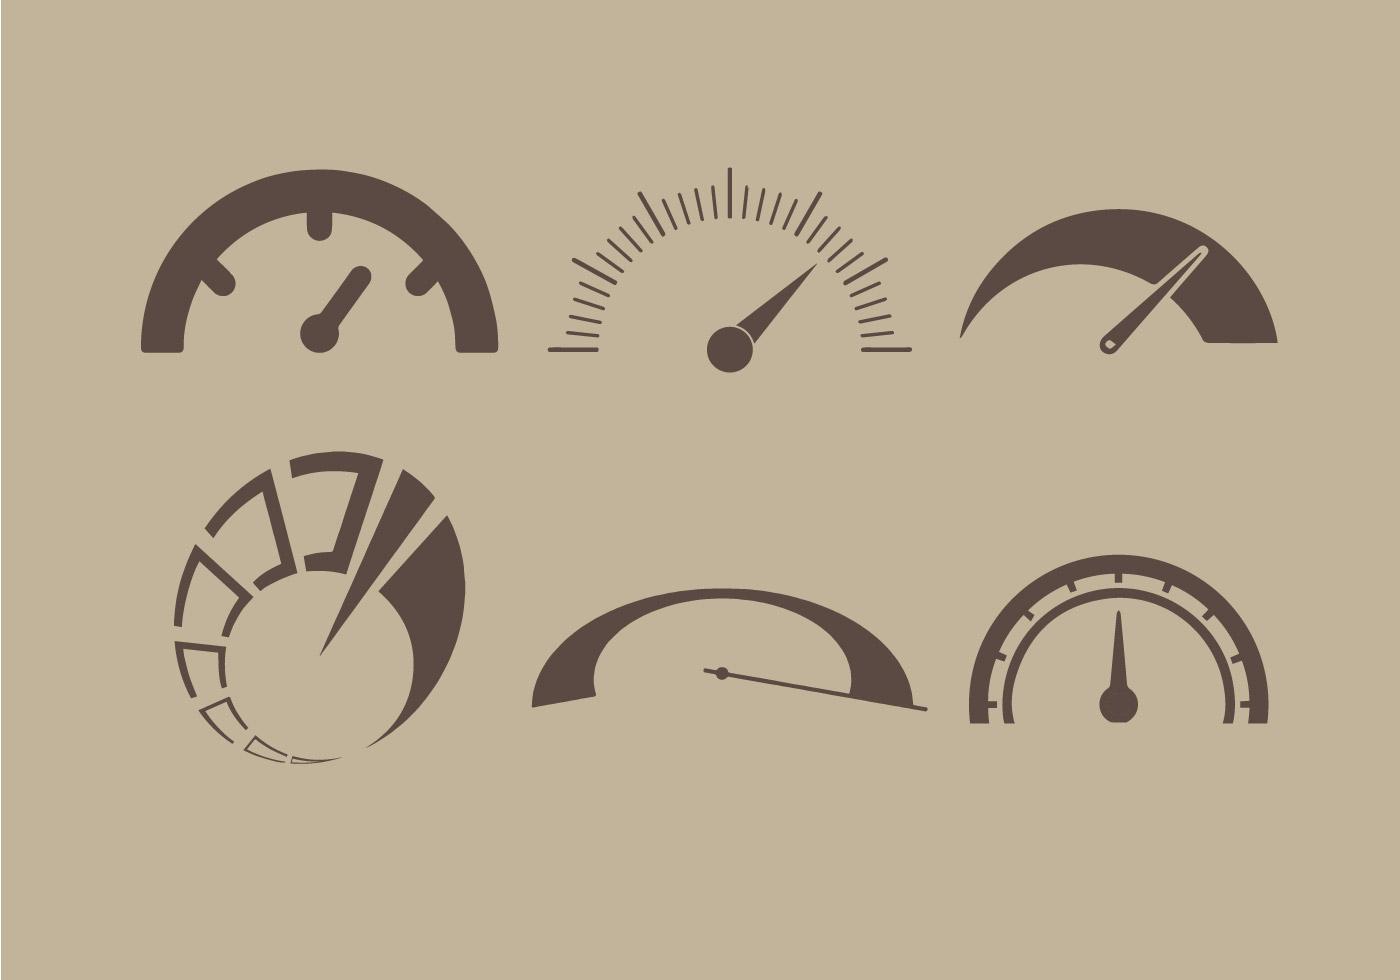 Tachometer Vector - Download Free Vector Art, Stock ... Tachometer Logo